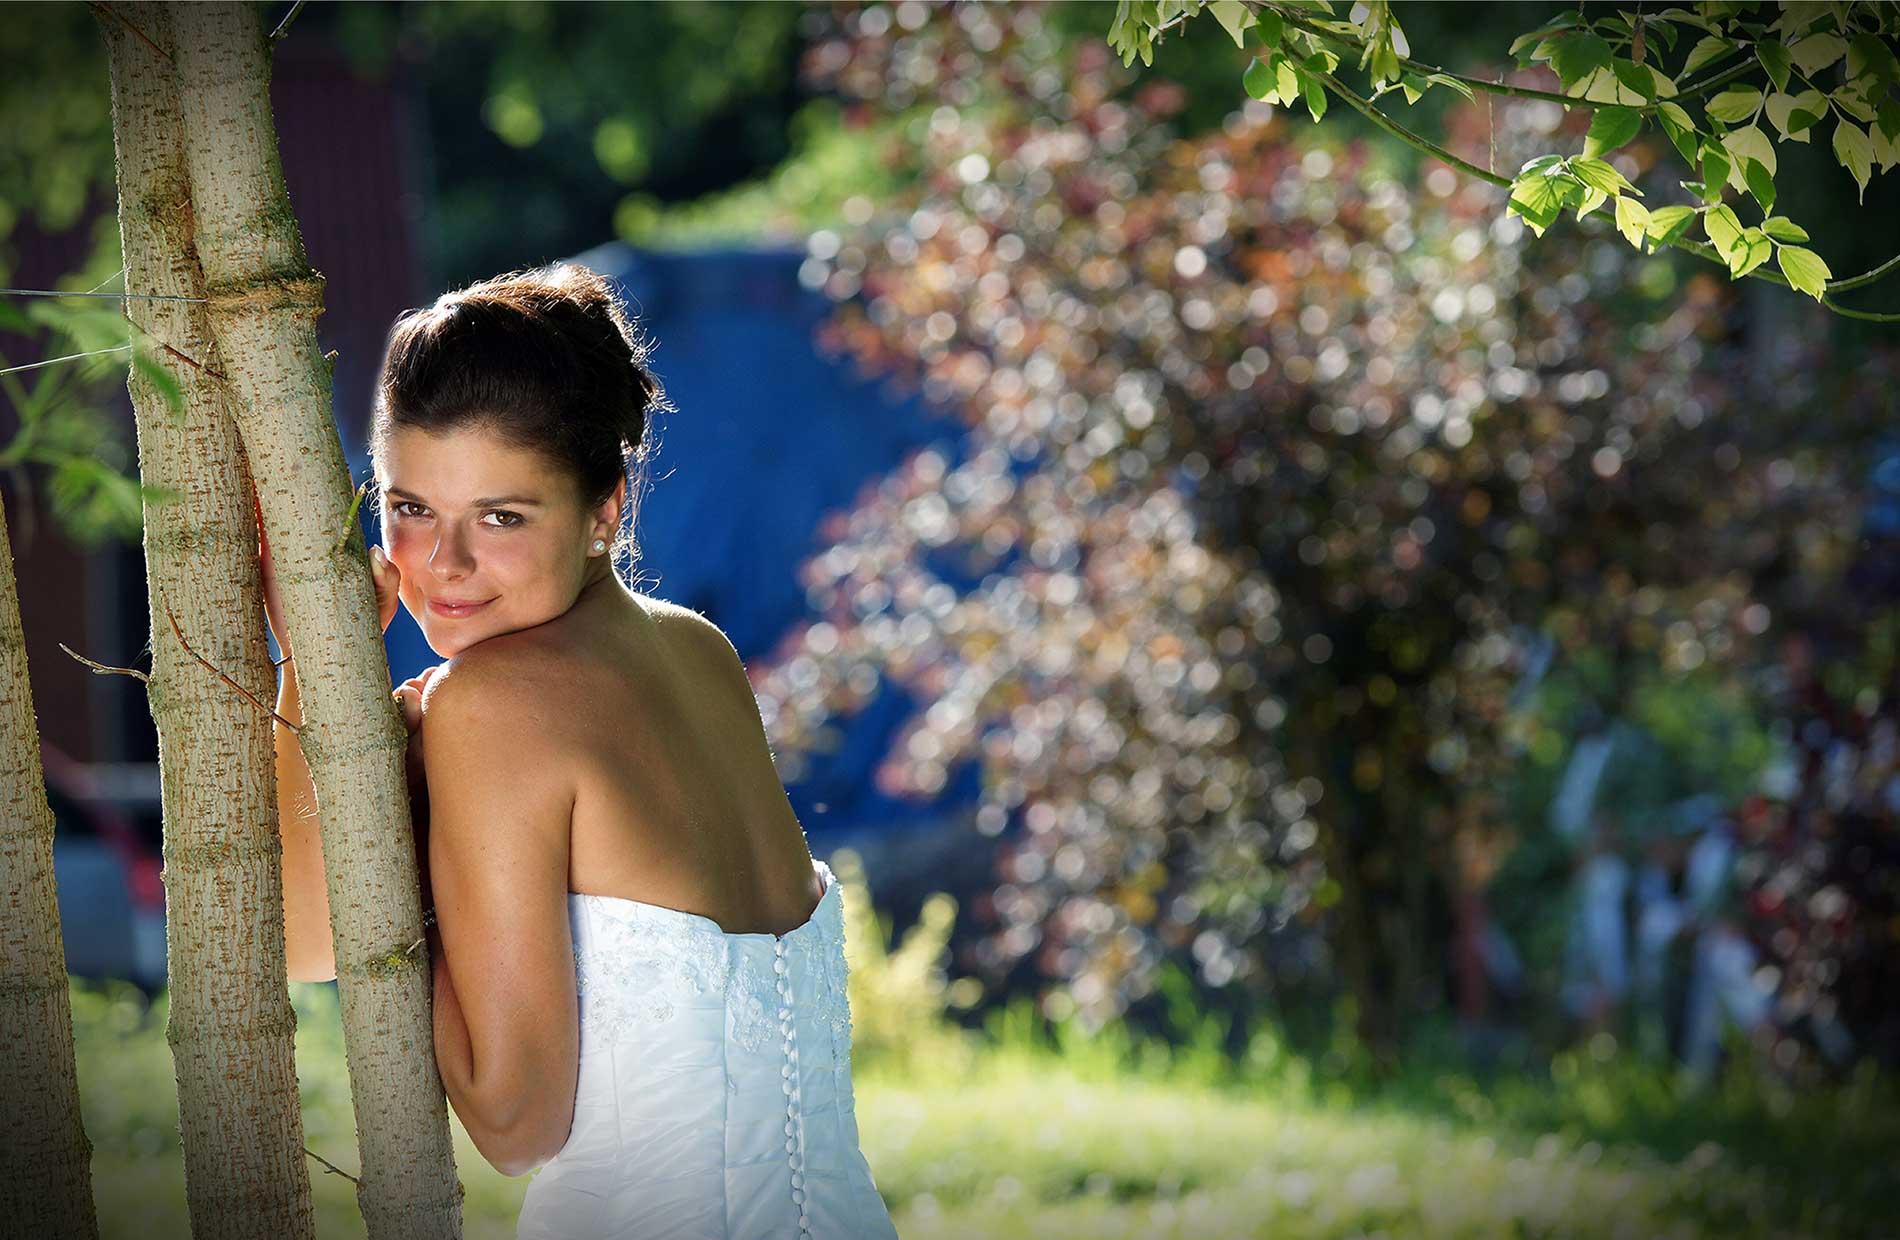 36 svatebni fotografie borovany cesky krumlov zlata koruna trebon ceske budejovice jihocesky kraj jizni cechy svatebni fotograf lipno nad vltavou potret tehotenske foto svatby 1